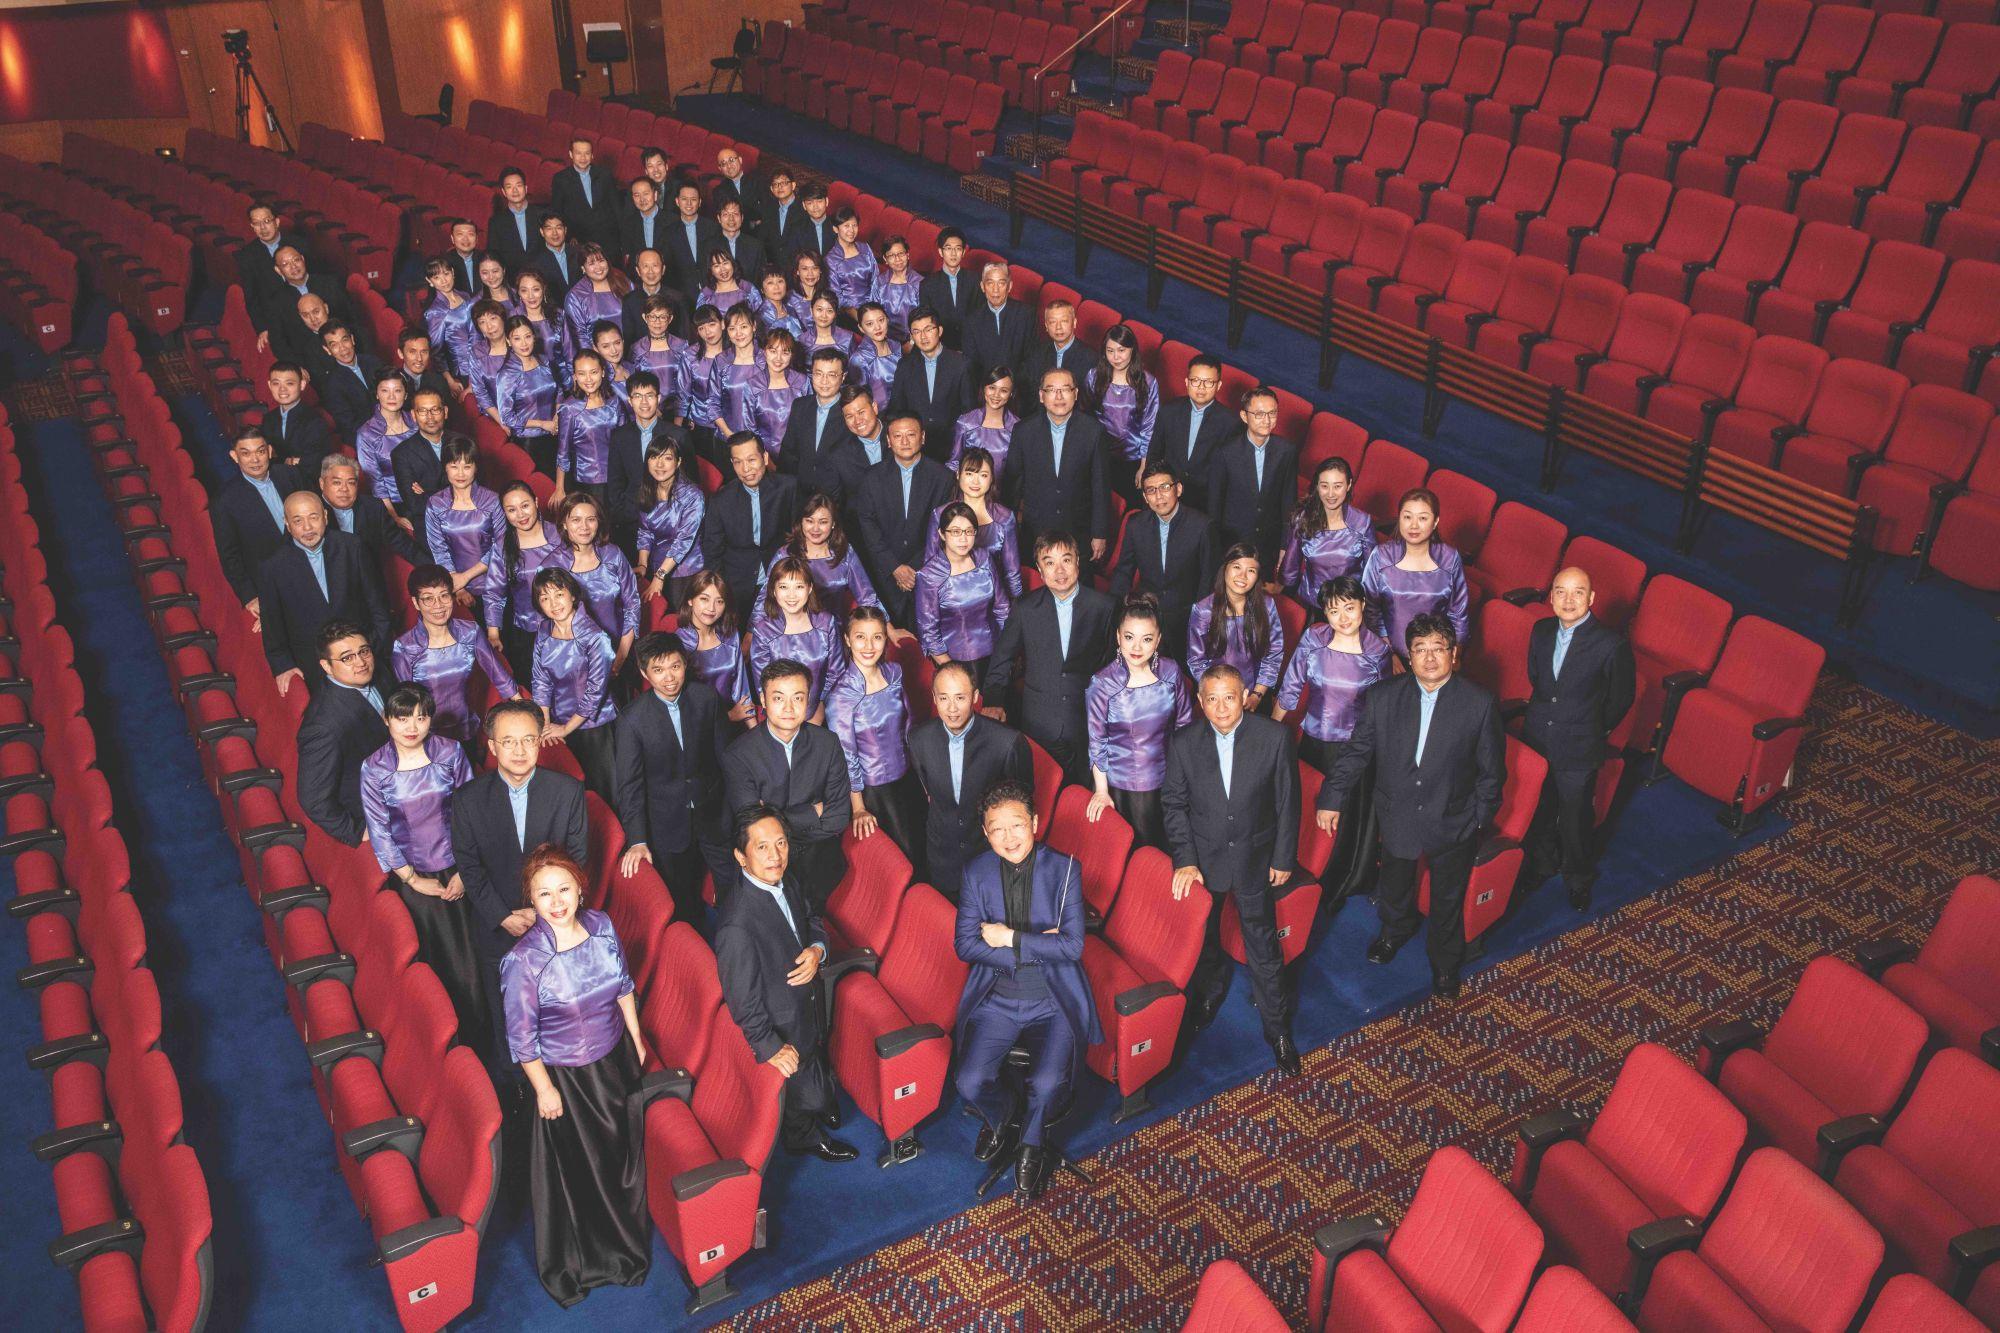 (Image: Singapore Chinese Orchestra)